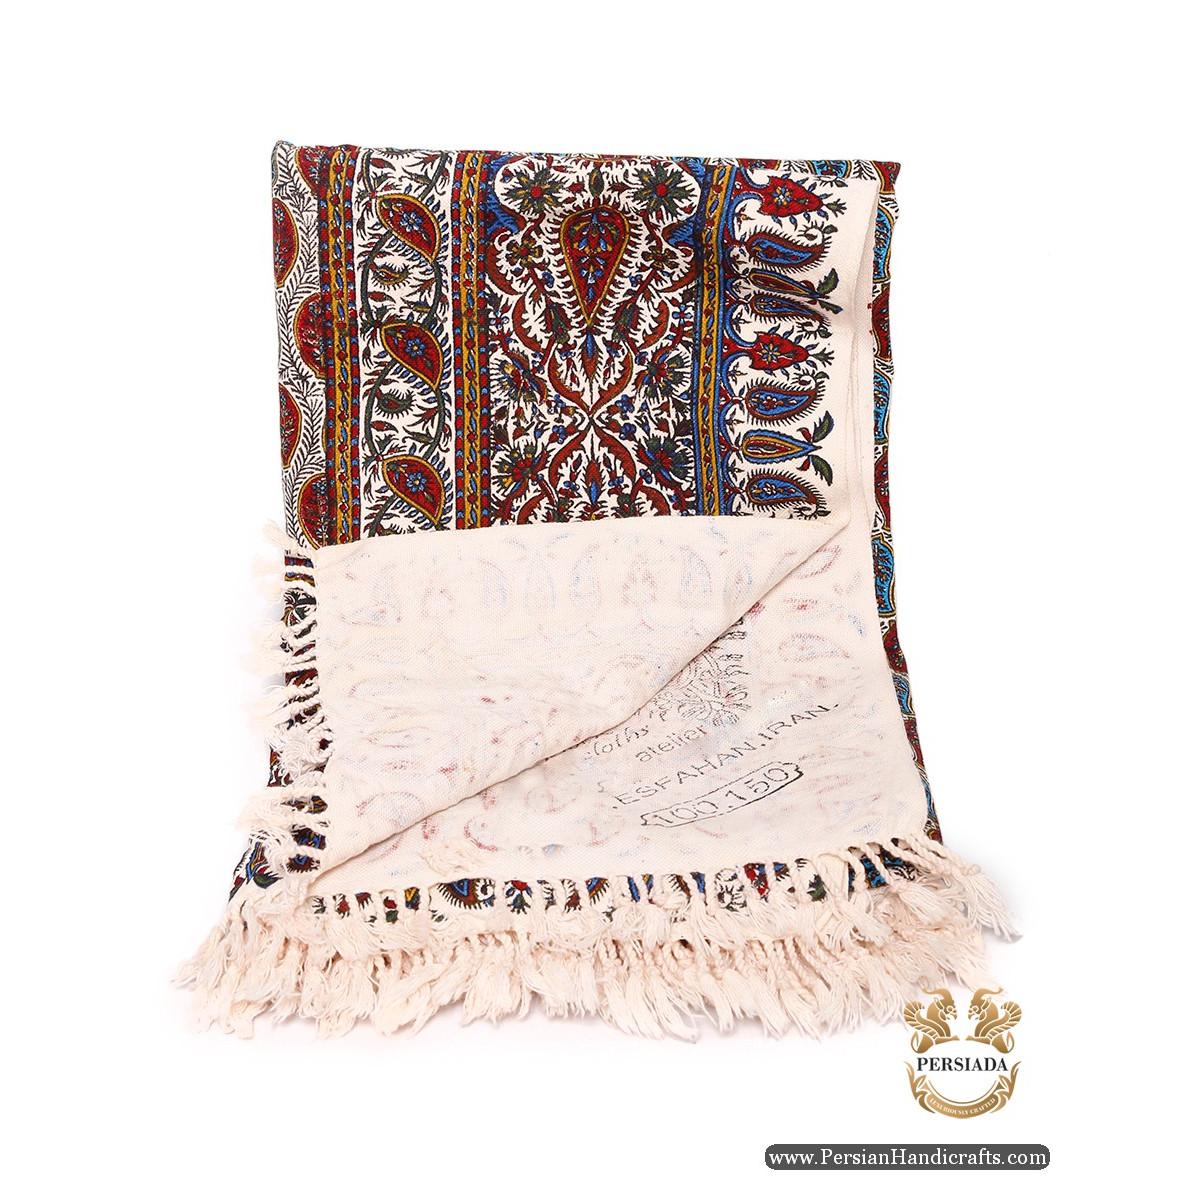 Rectangle Tablecloth   Hand Printed Ghalamkar   Persiada HGH6108